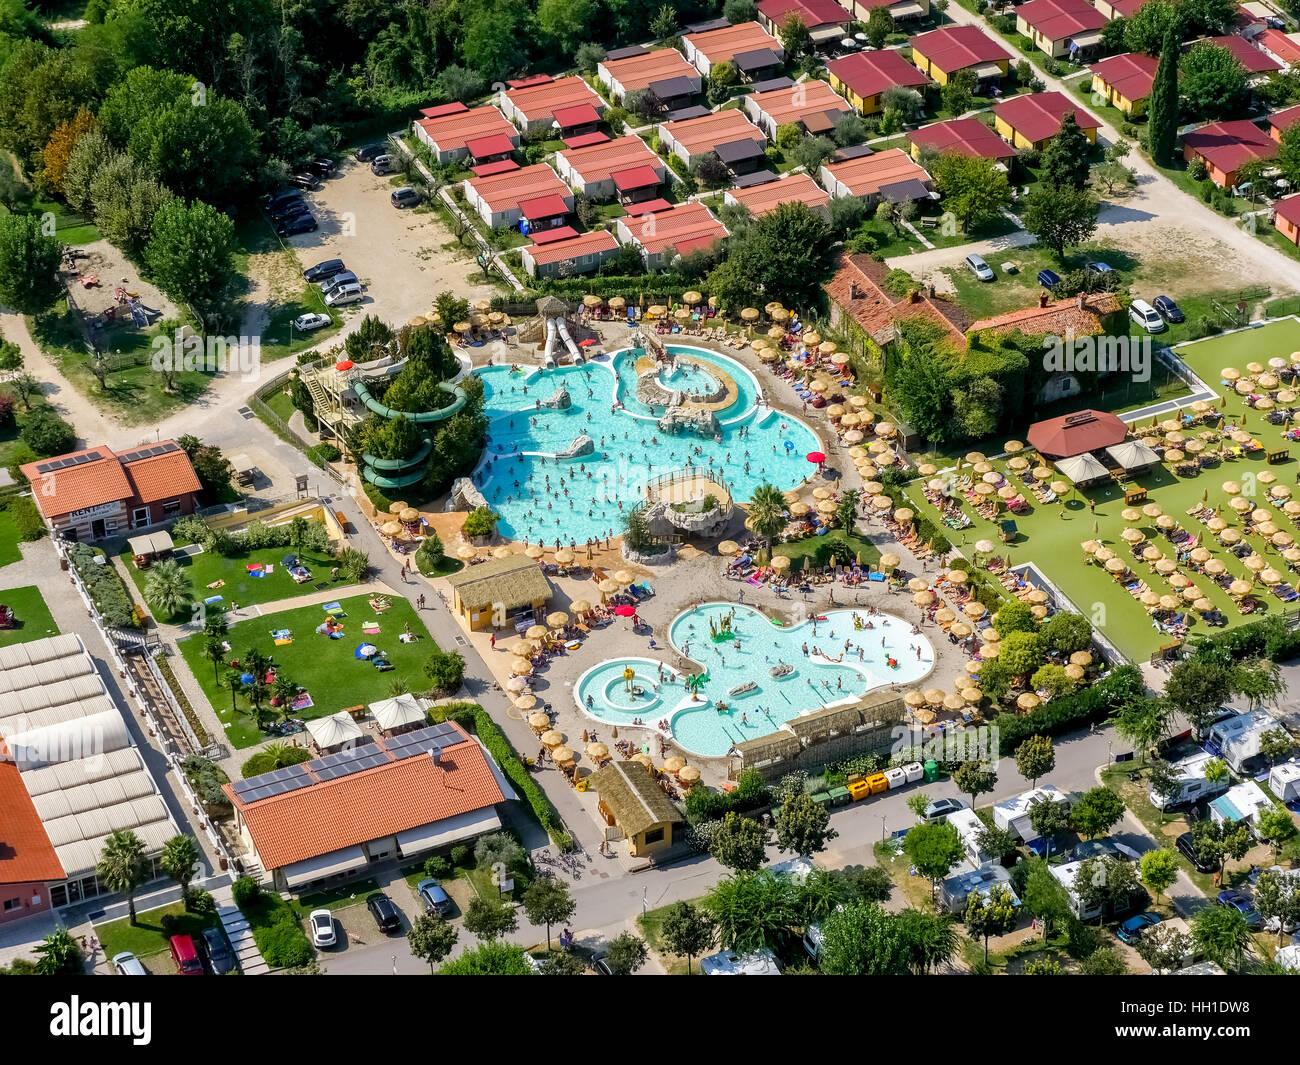 Vista a rea da piani di clodia camping parque de campismo for Piani di piscina